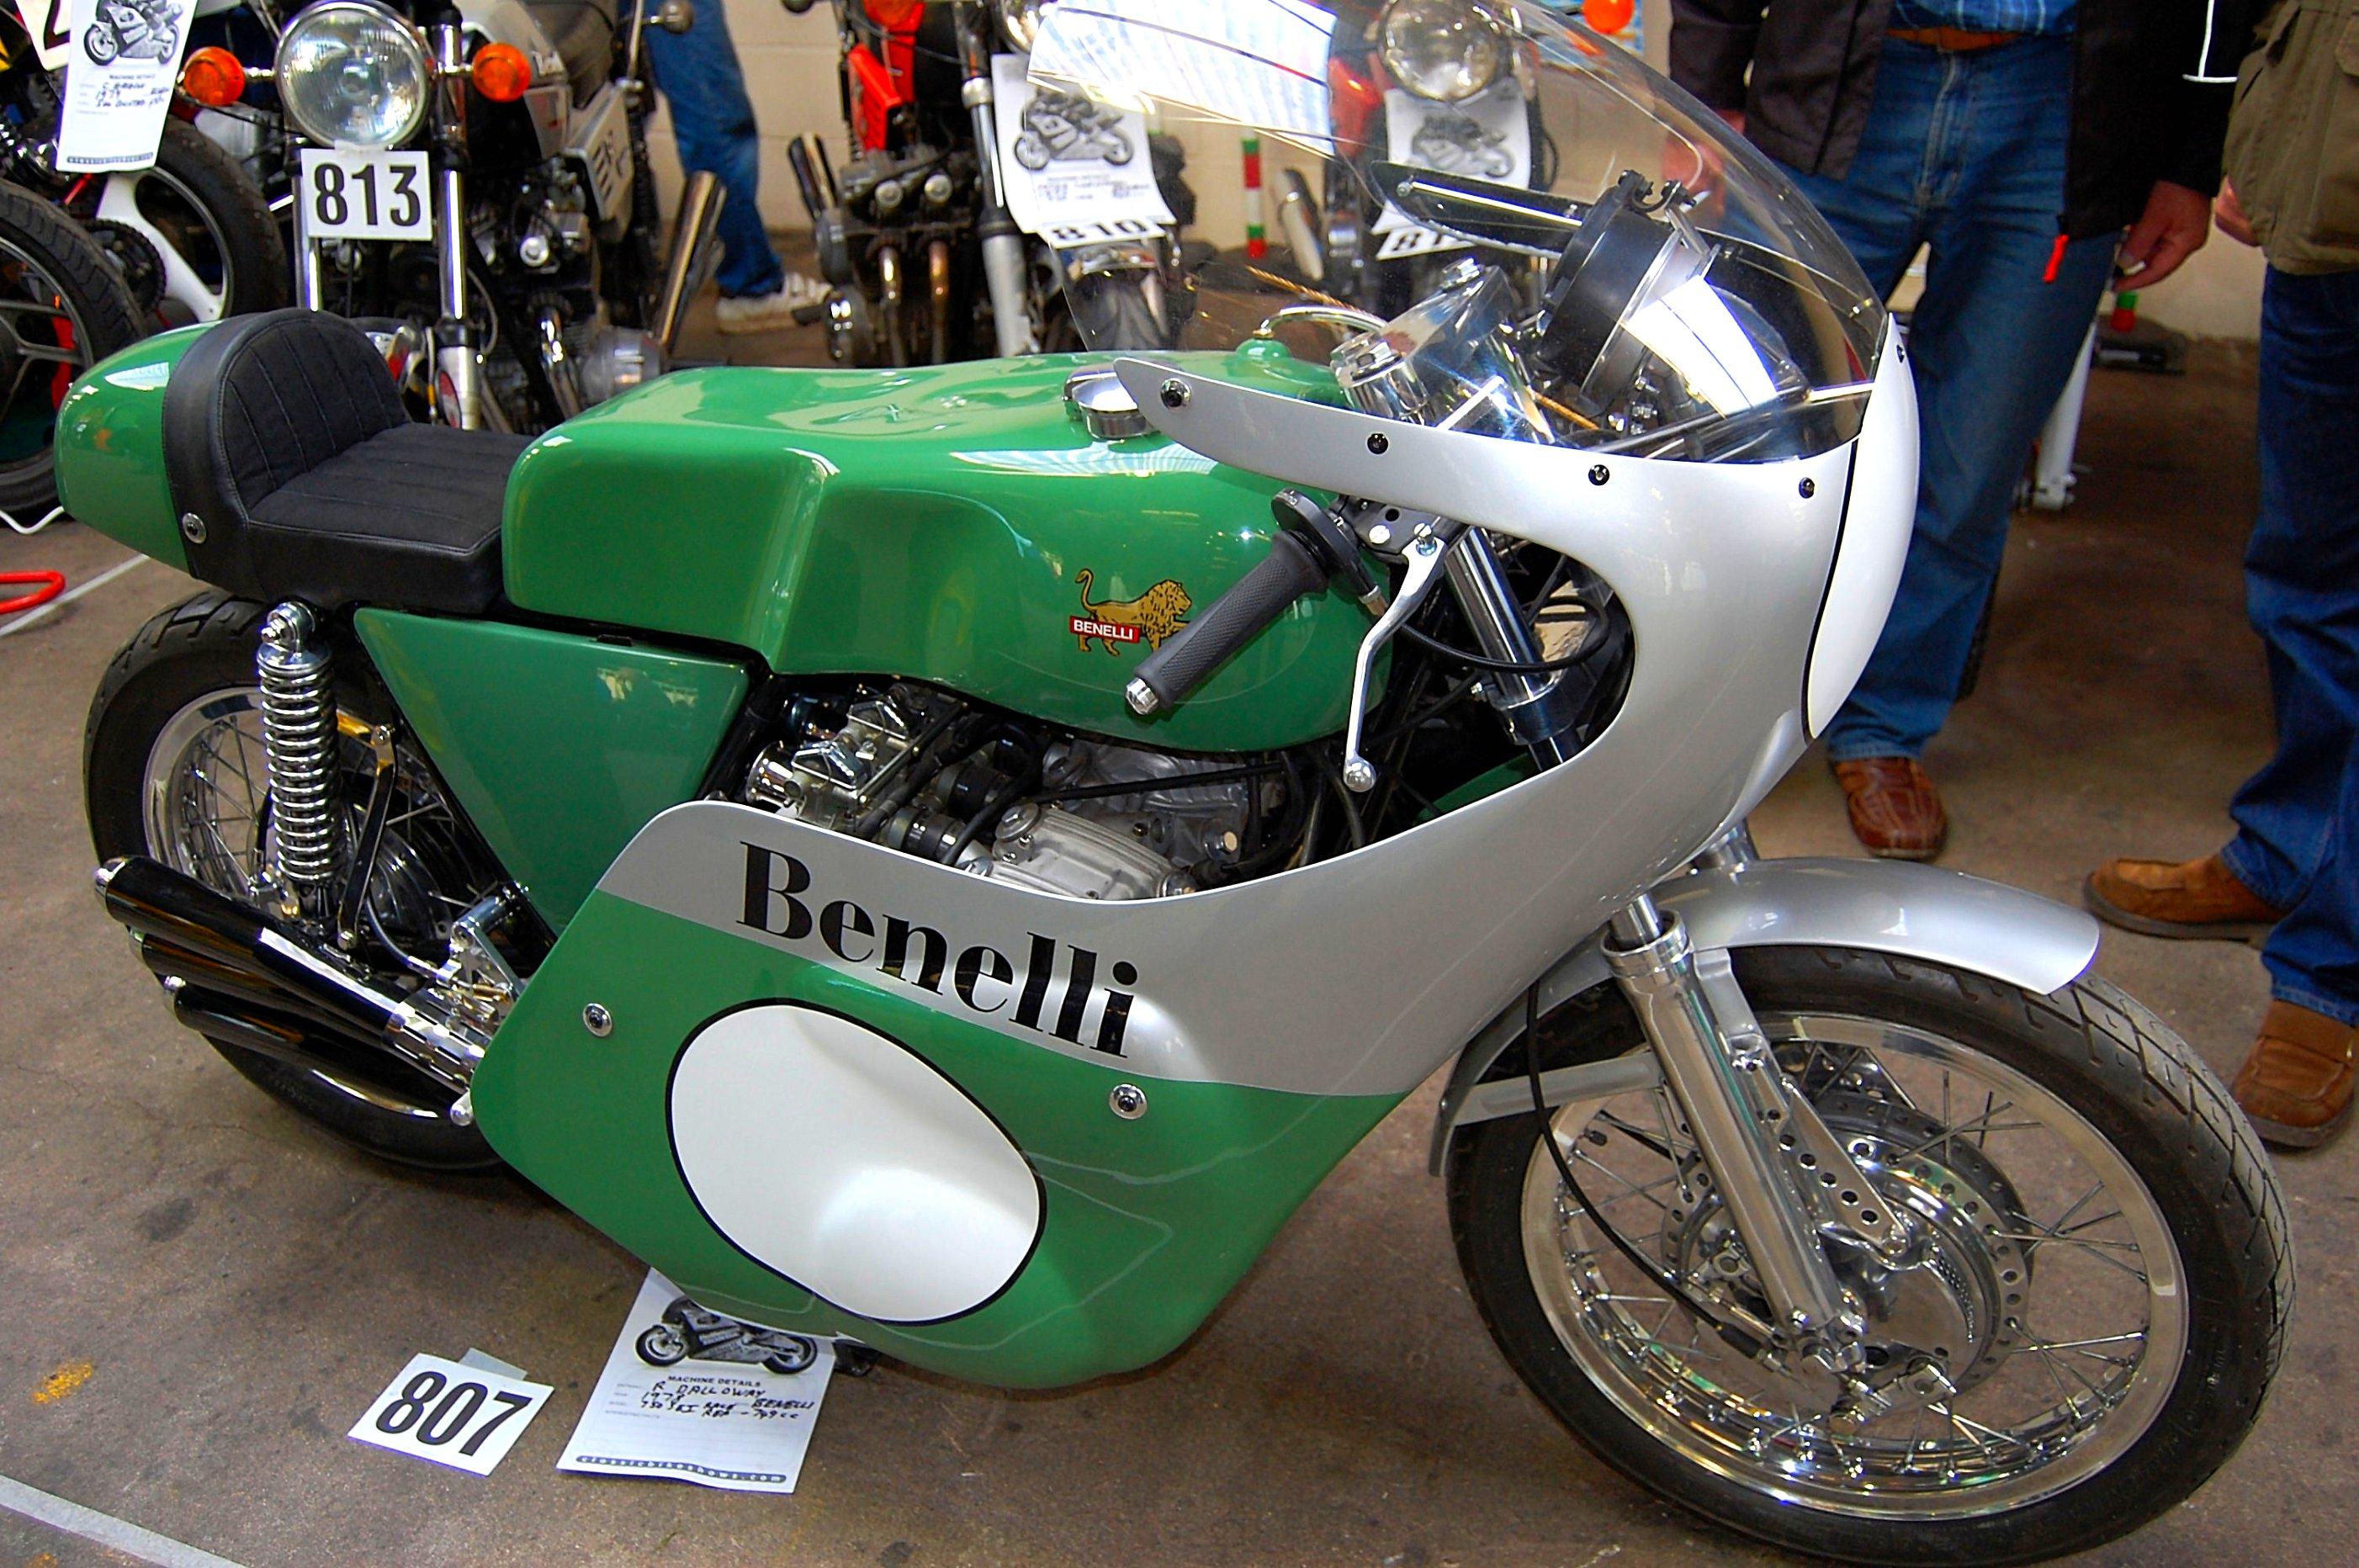 File:Flickr - ronsaunders47 - BENELLI 750cc RACE REPLICA. 1978..jpg -  Wikimedia Commons